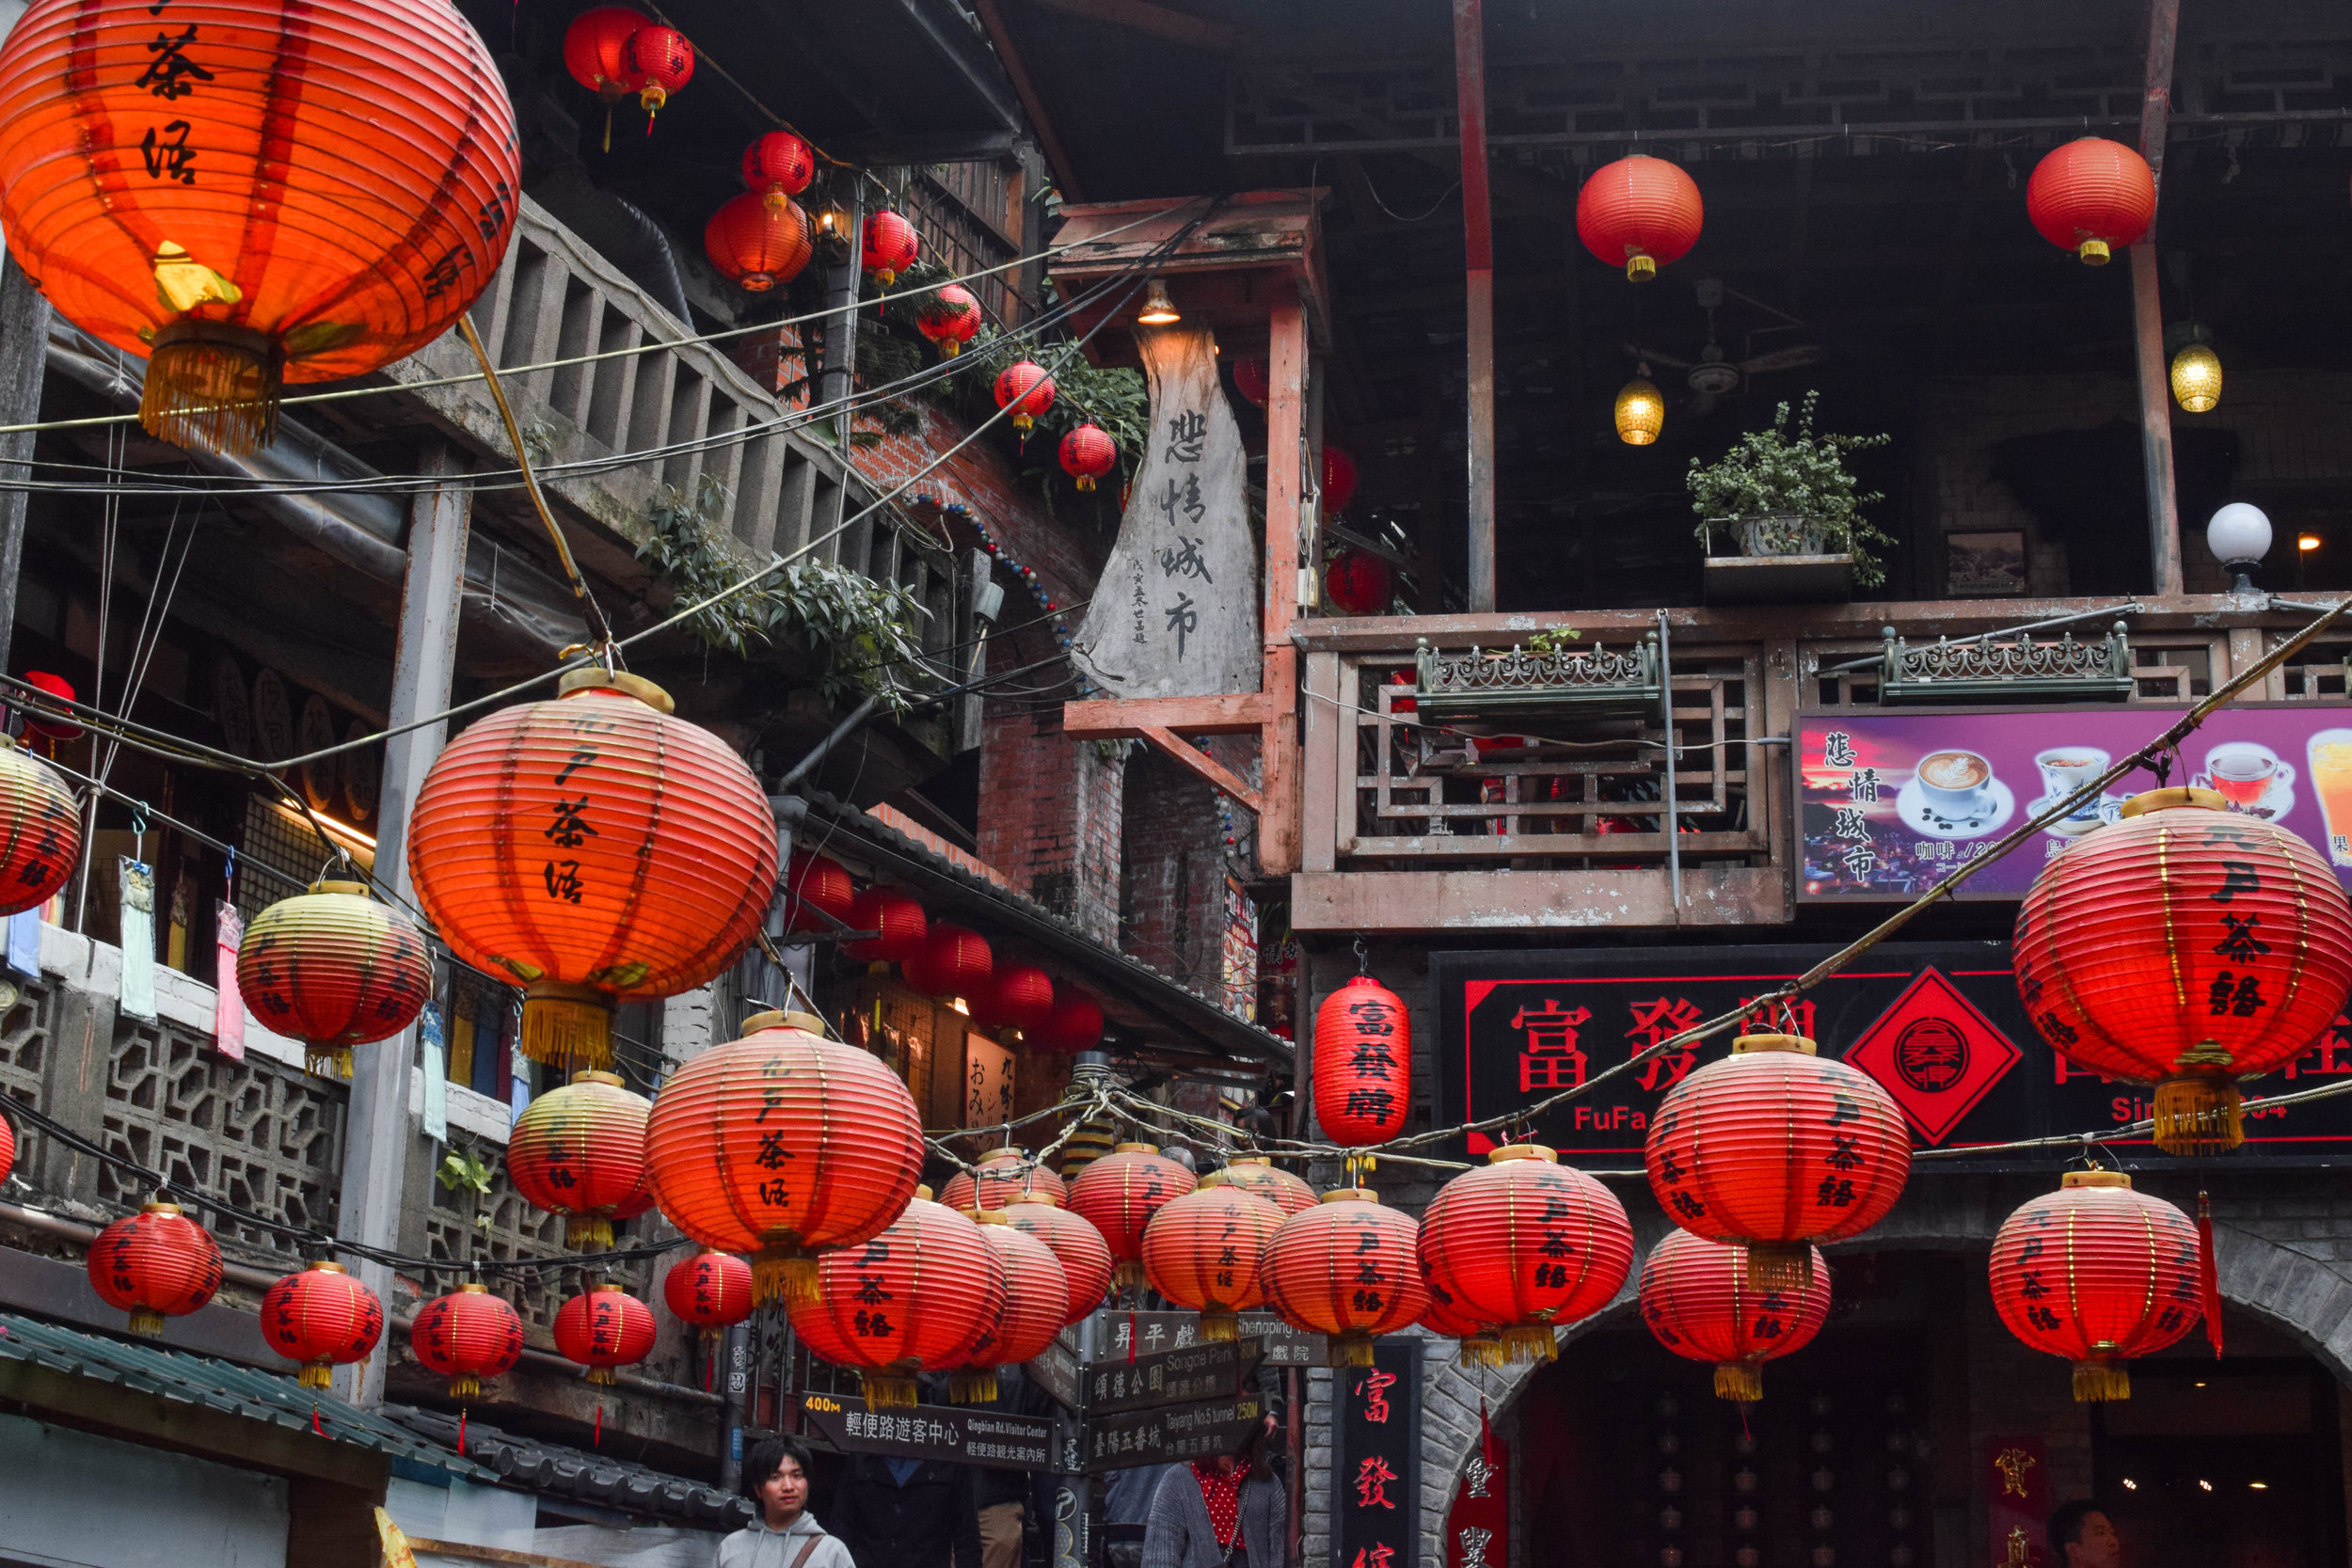 Lanterns. Lanterns everywhere.